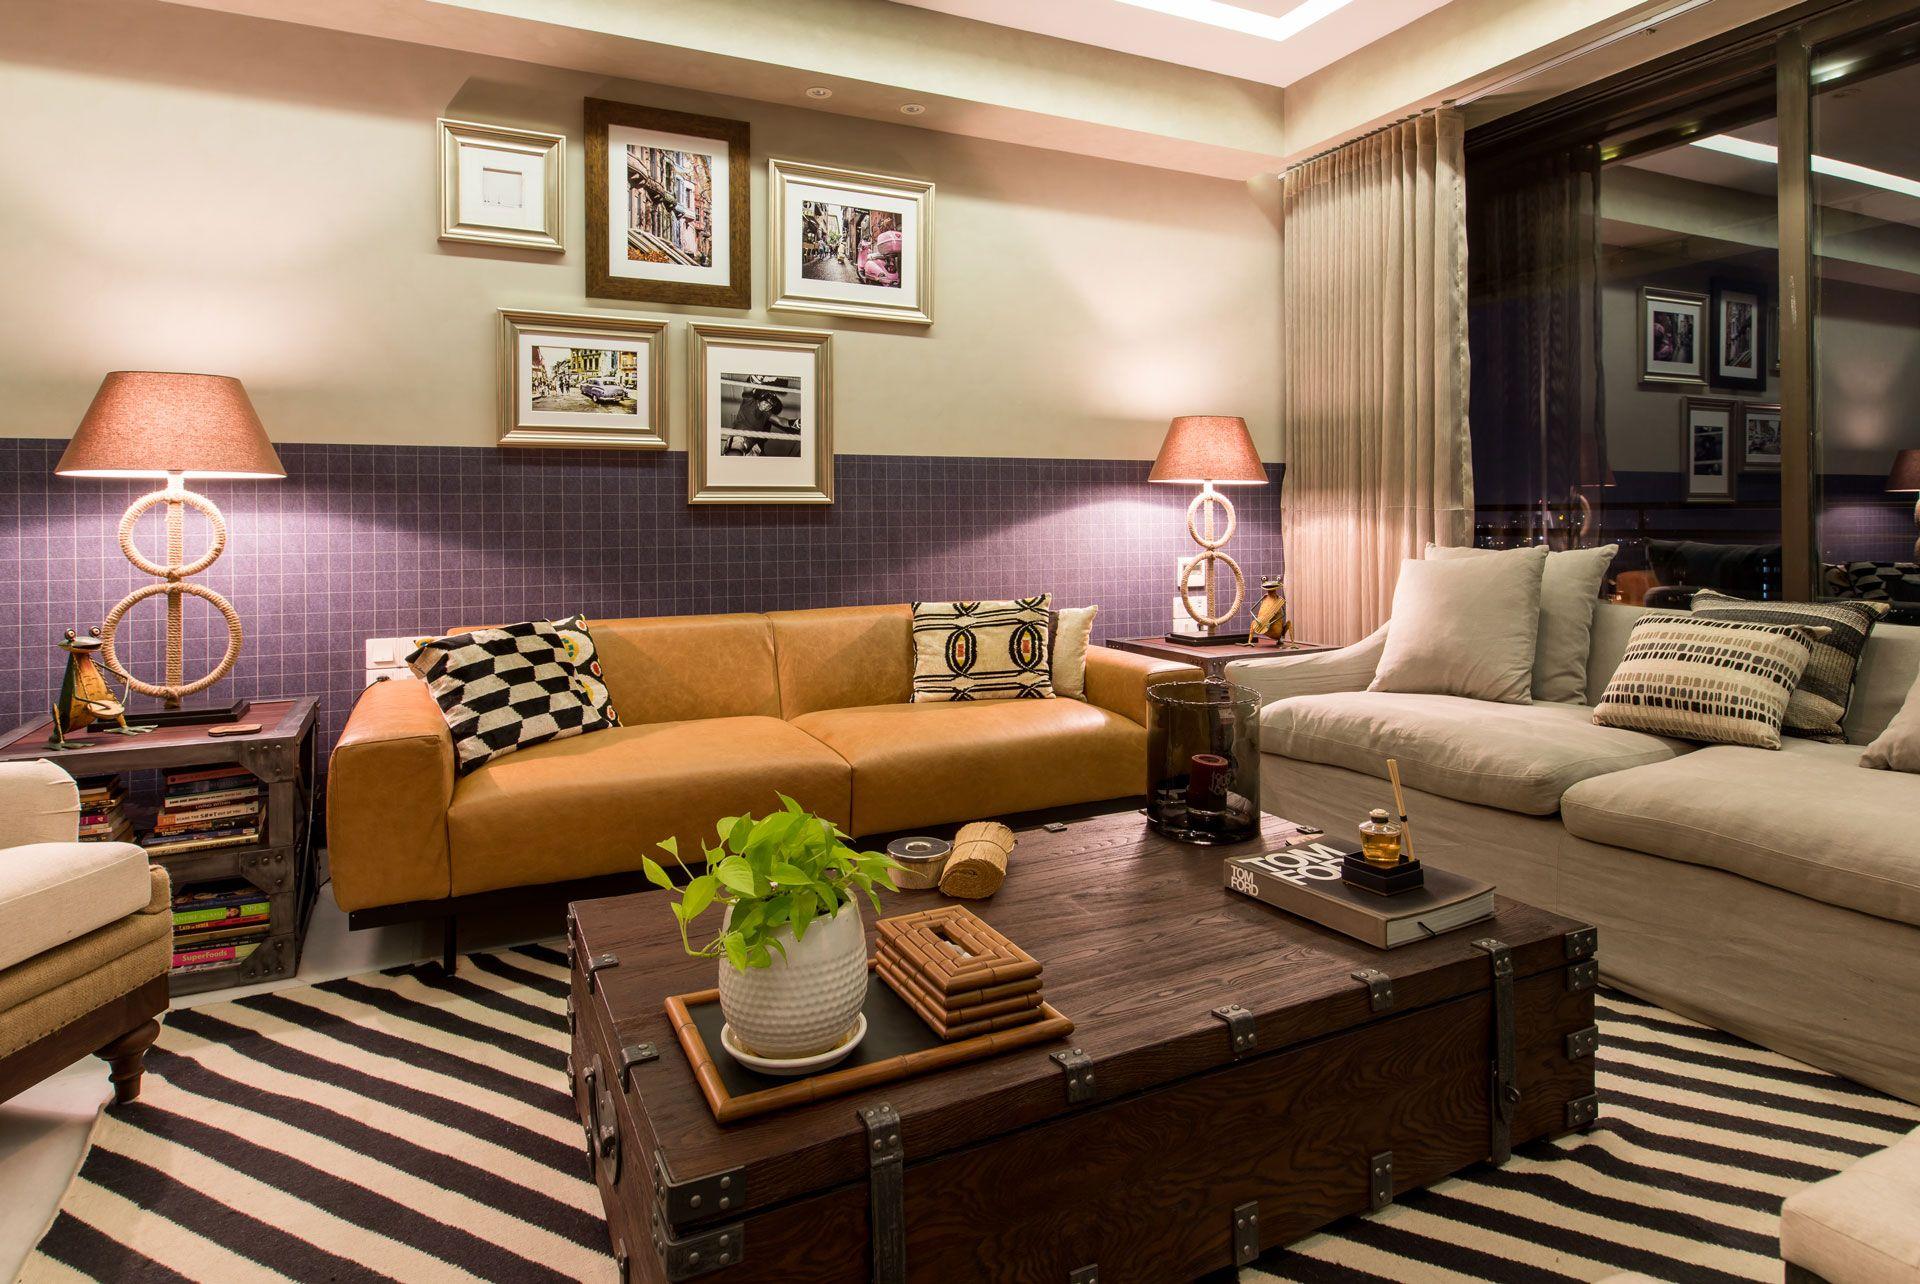 The Studio Gauri Khan Designs Contemporary Home Furniture